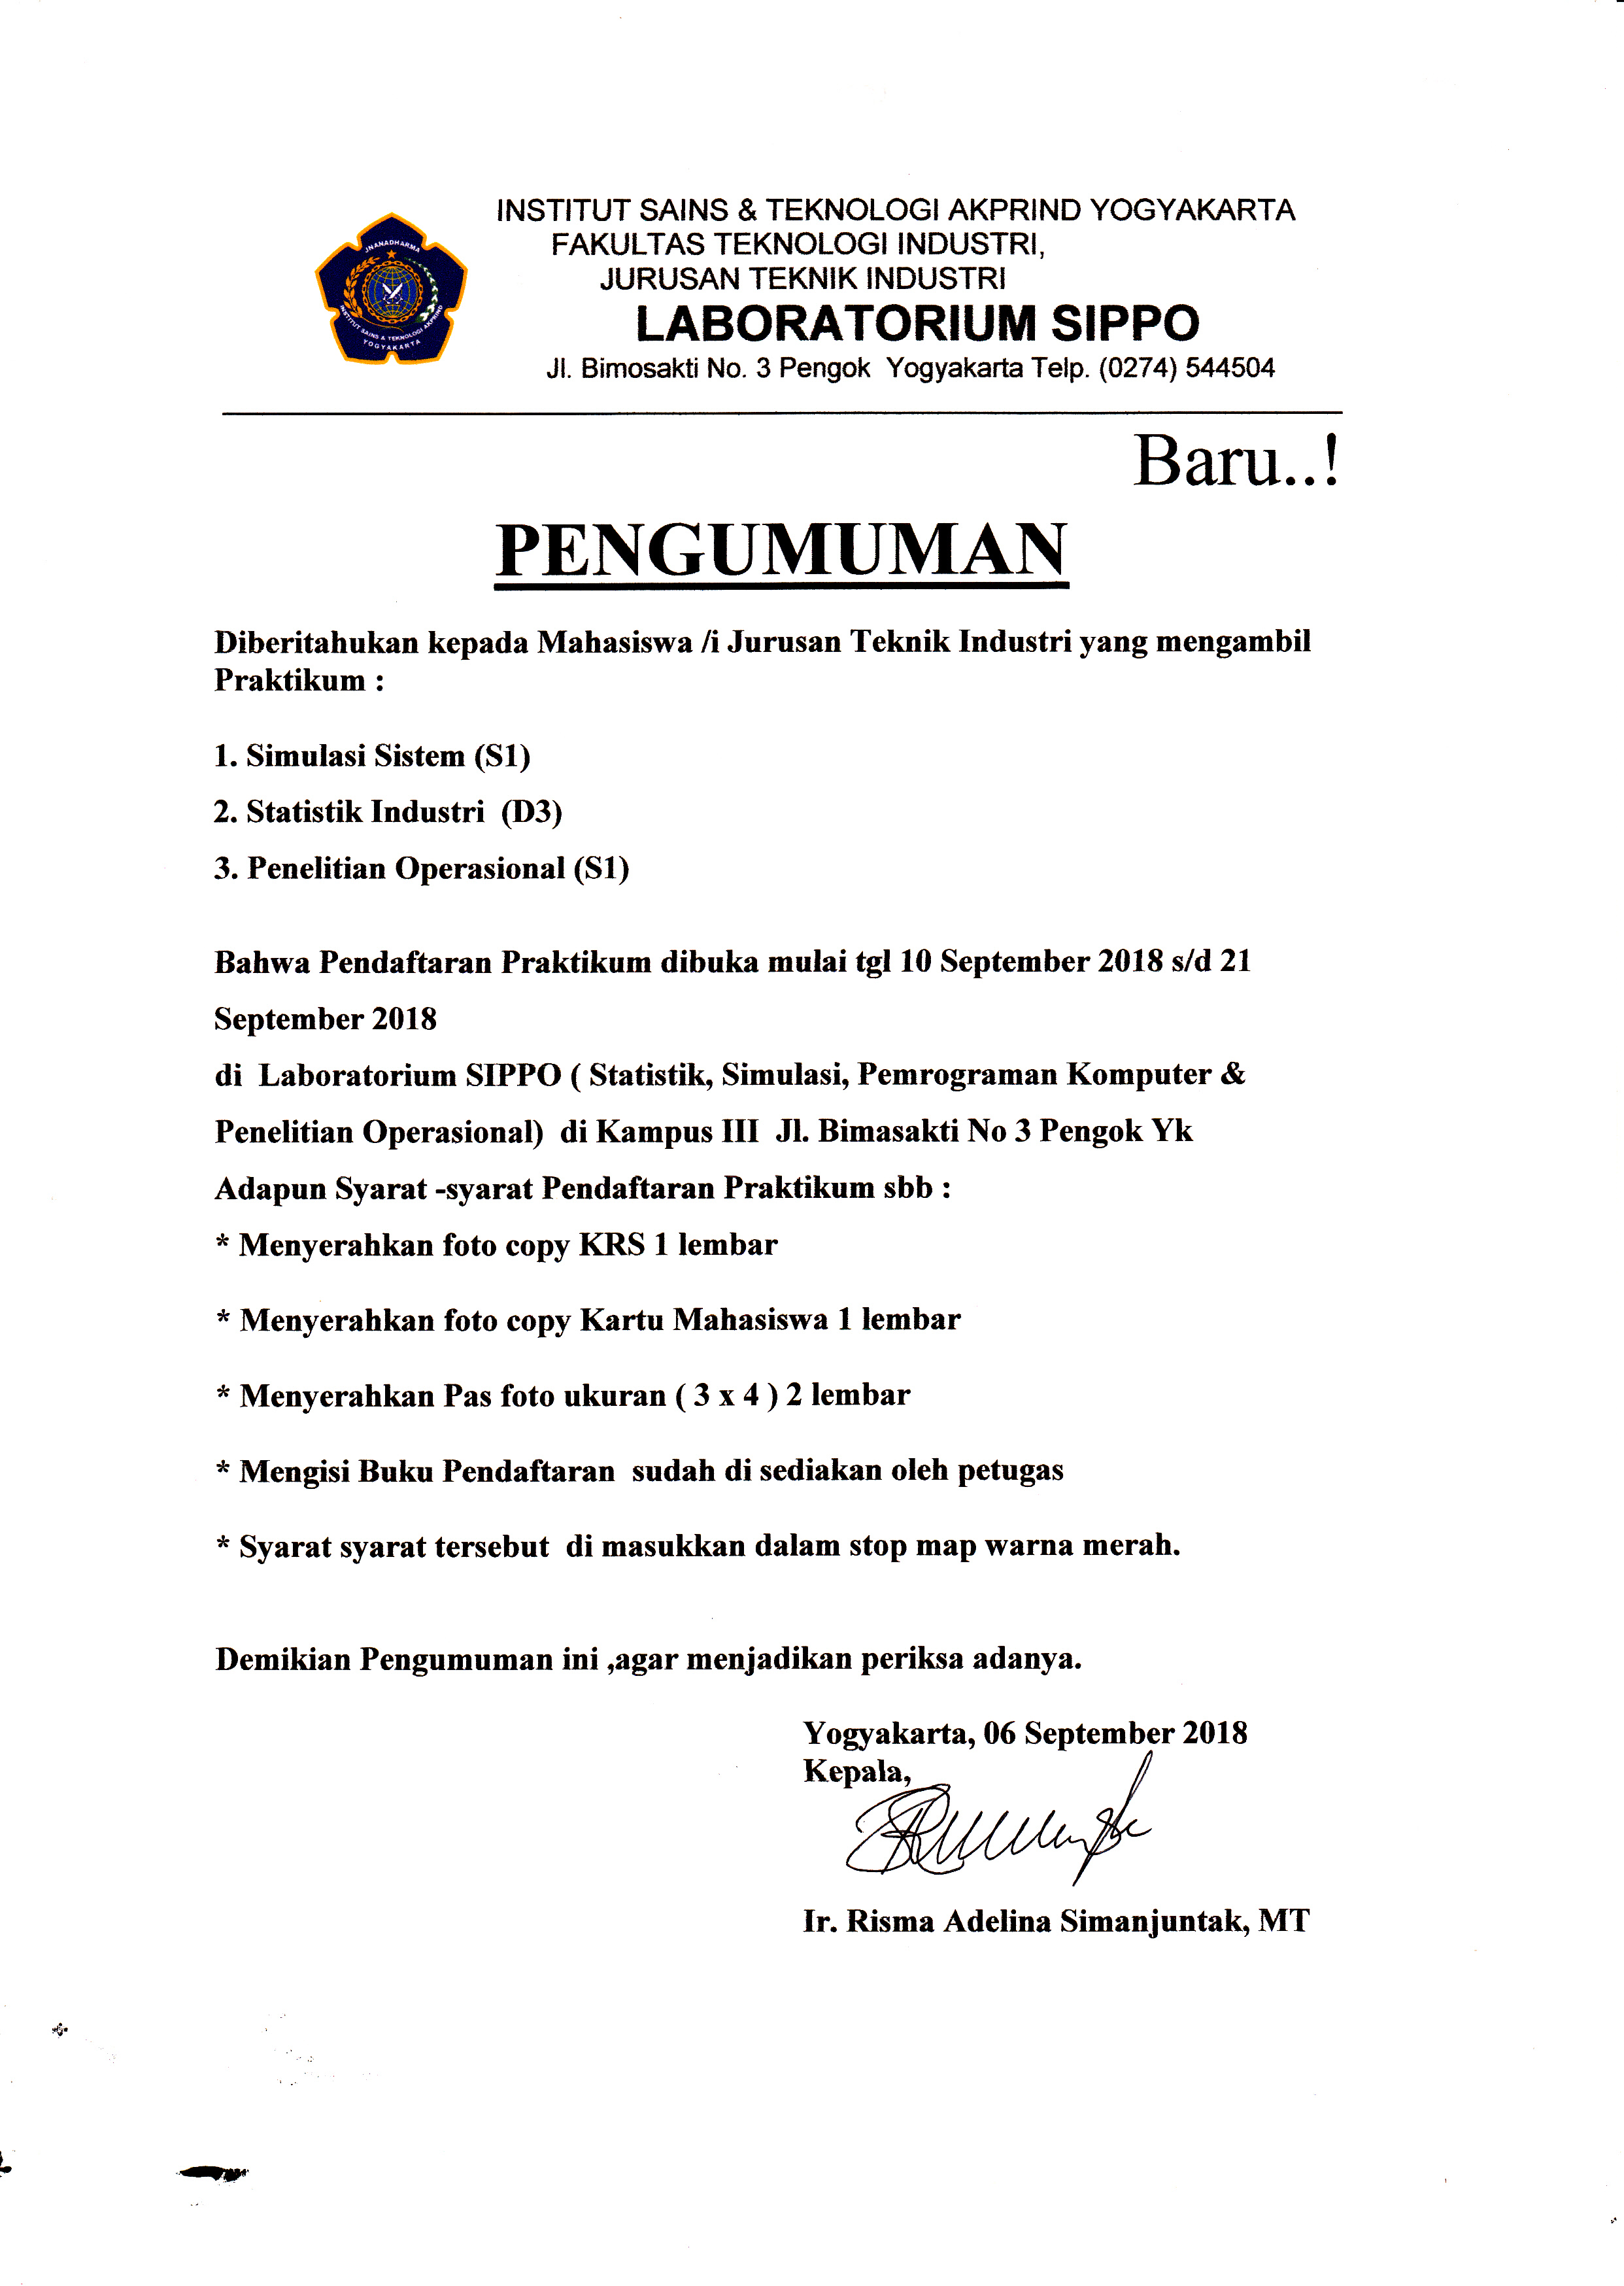 pendaftaran praktikum sippo sem ganjil 2018-2019 Jurusan Teknik Industri IST AKPRIND Yogyakarta